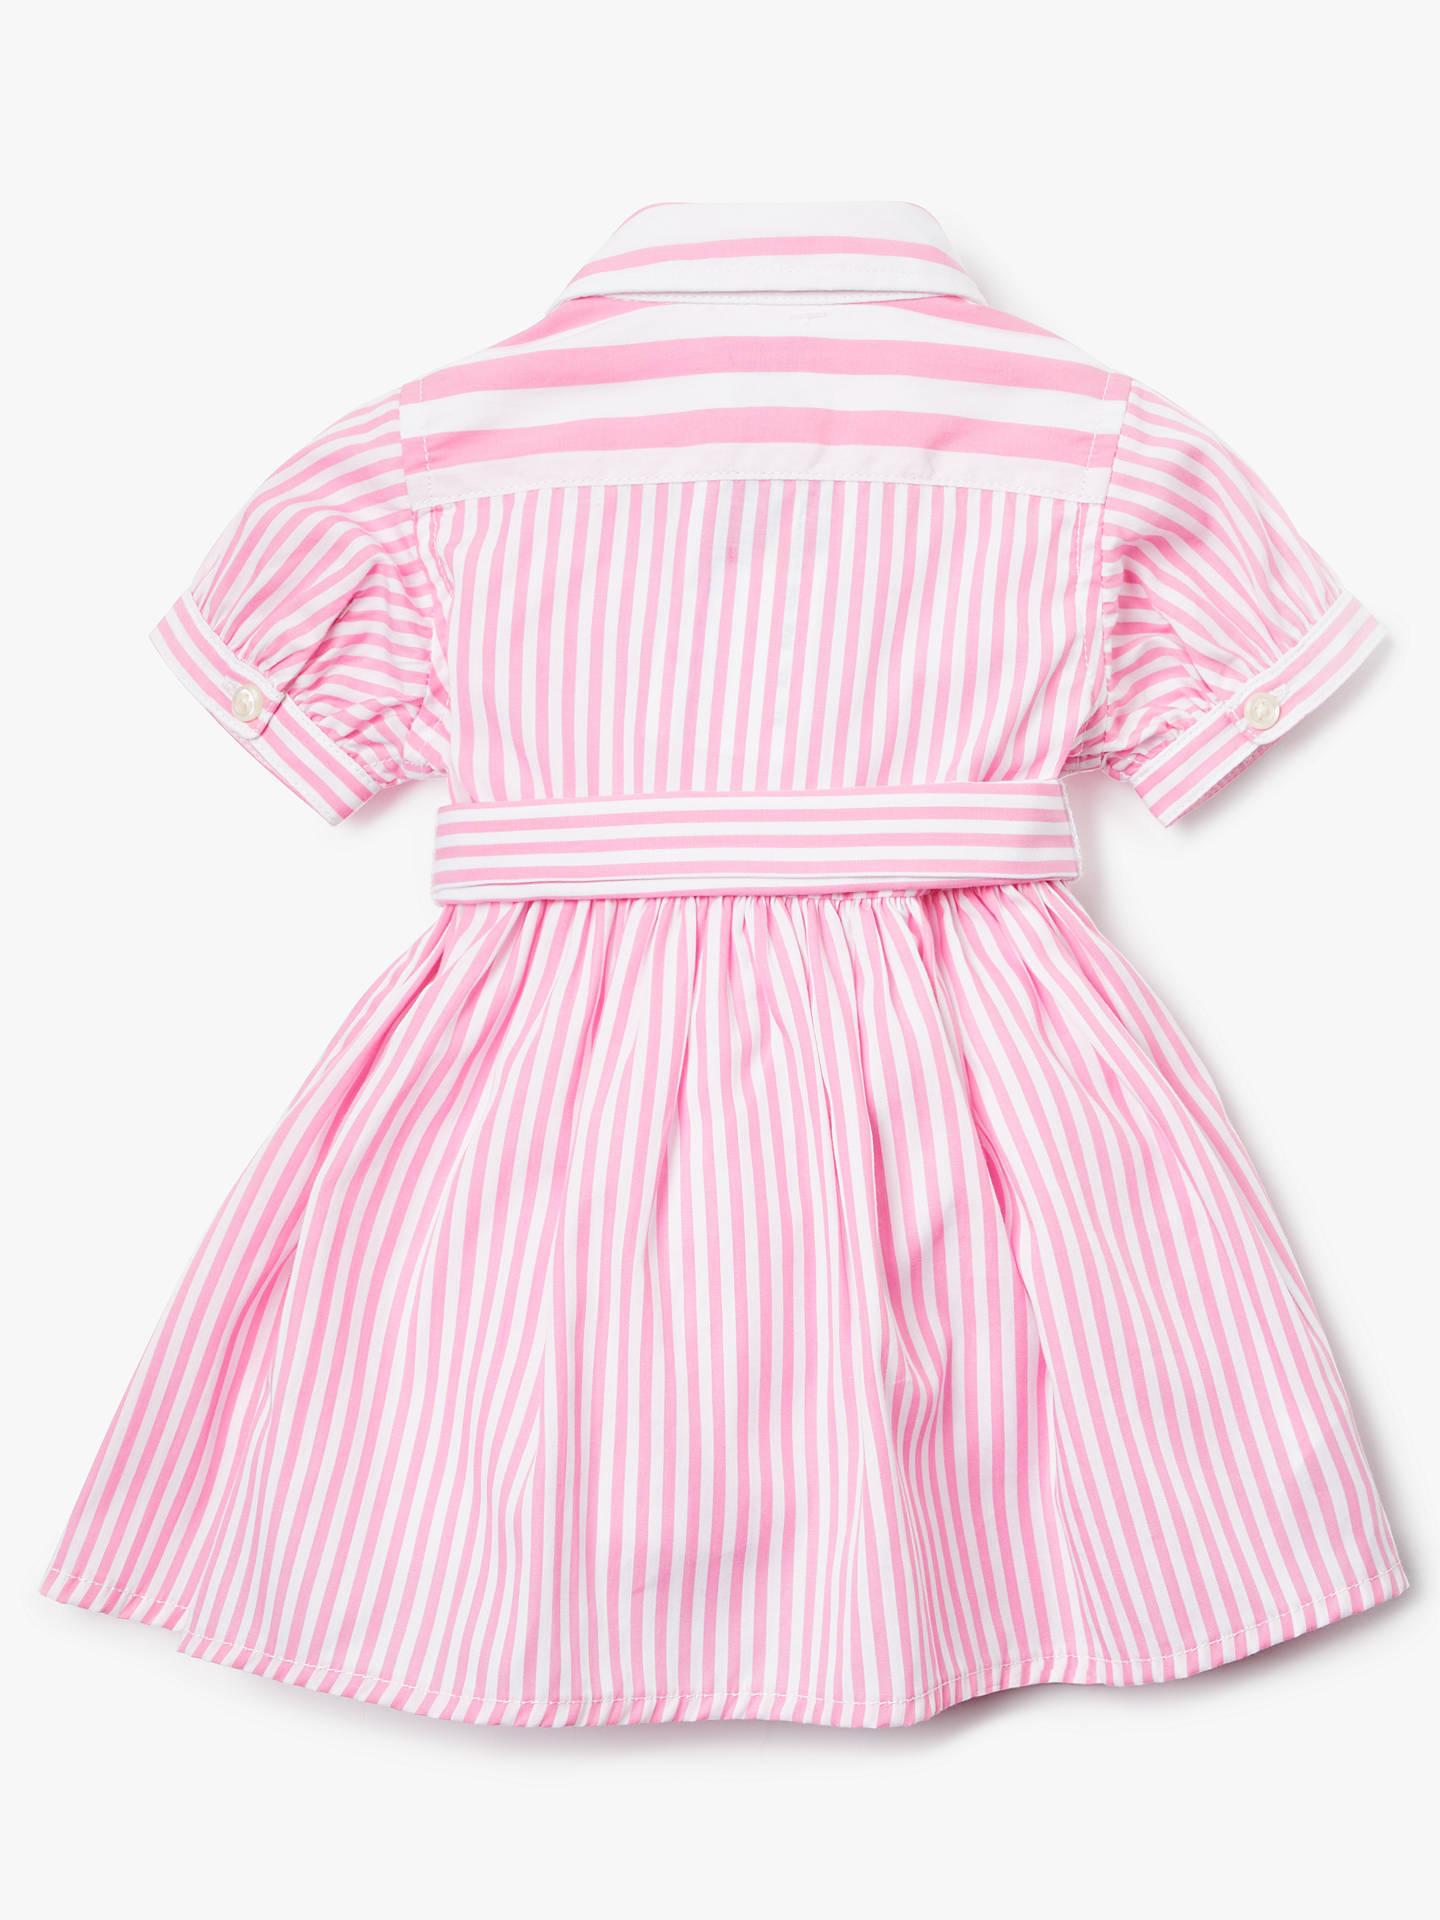 065fc441 Polo Ralph Lauren Baby Stripe Shirt Dress, Pink at John Lewis & Partners